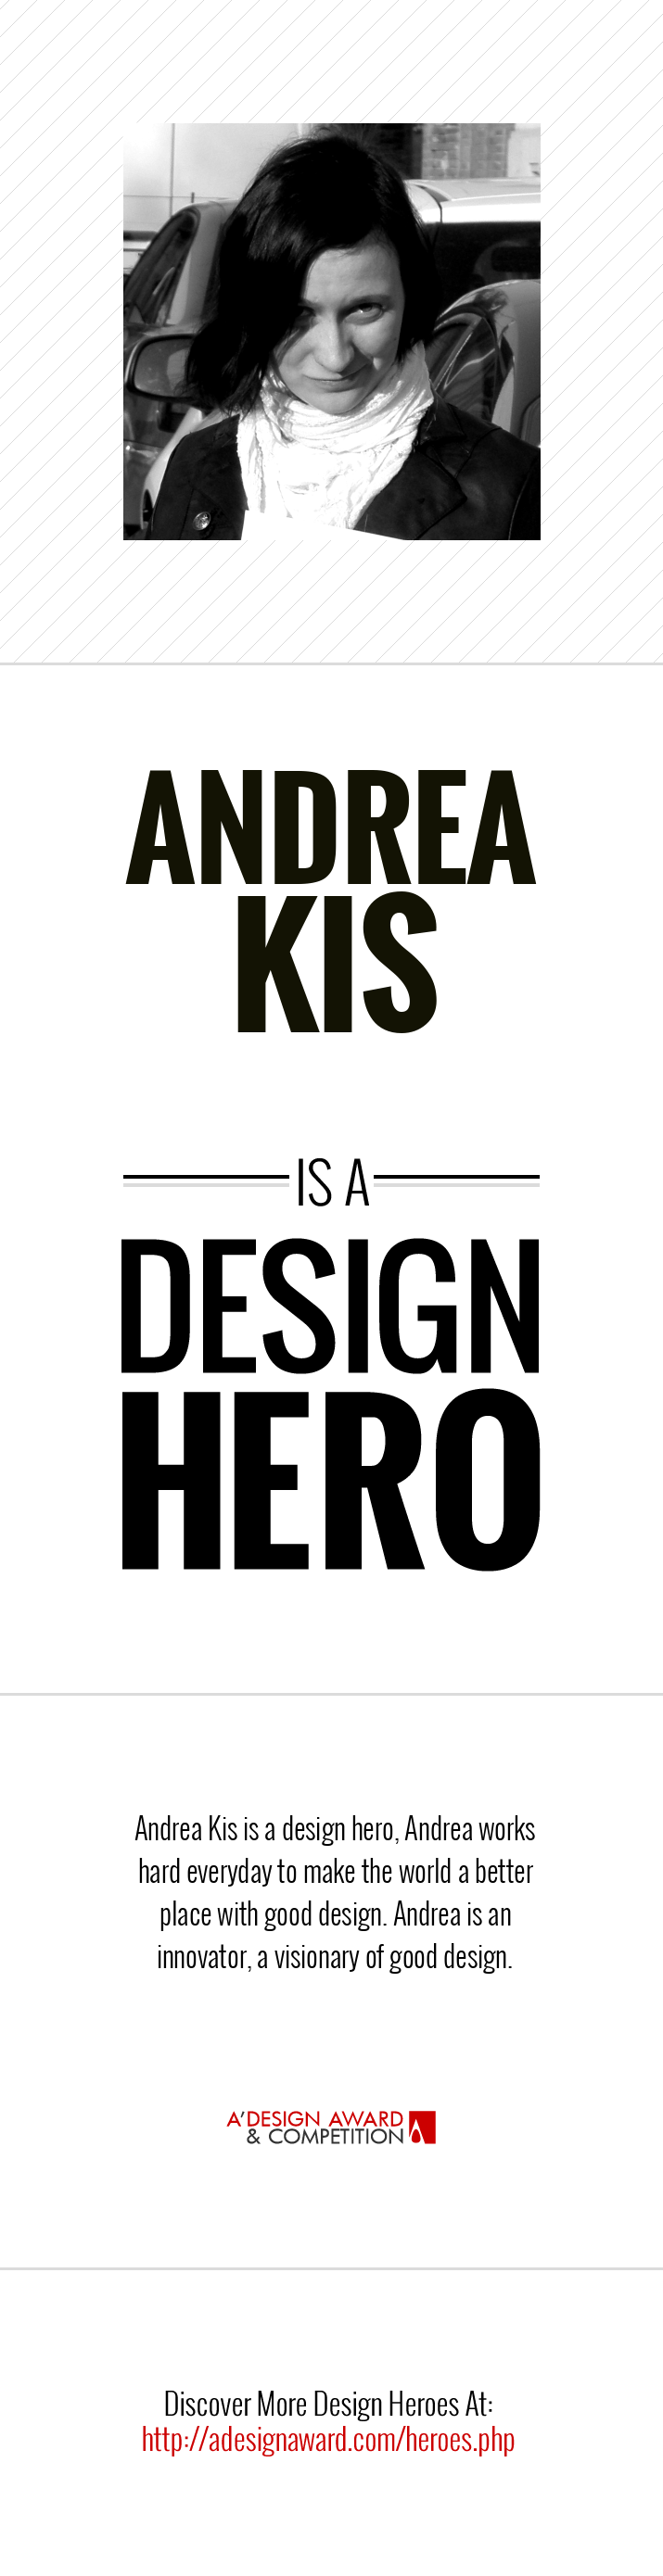 postcard design hero andrea kis a'design